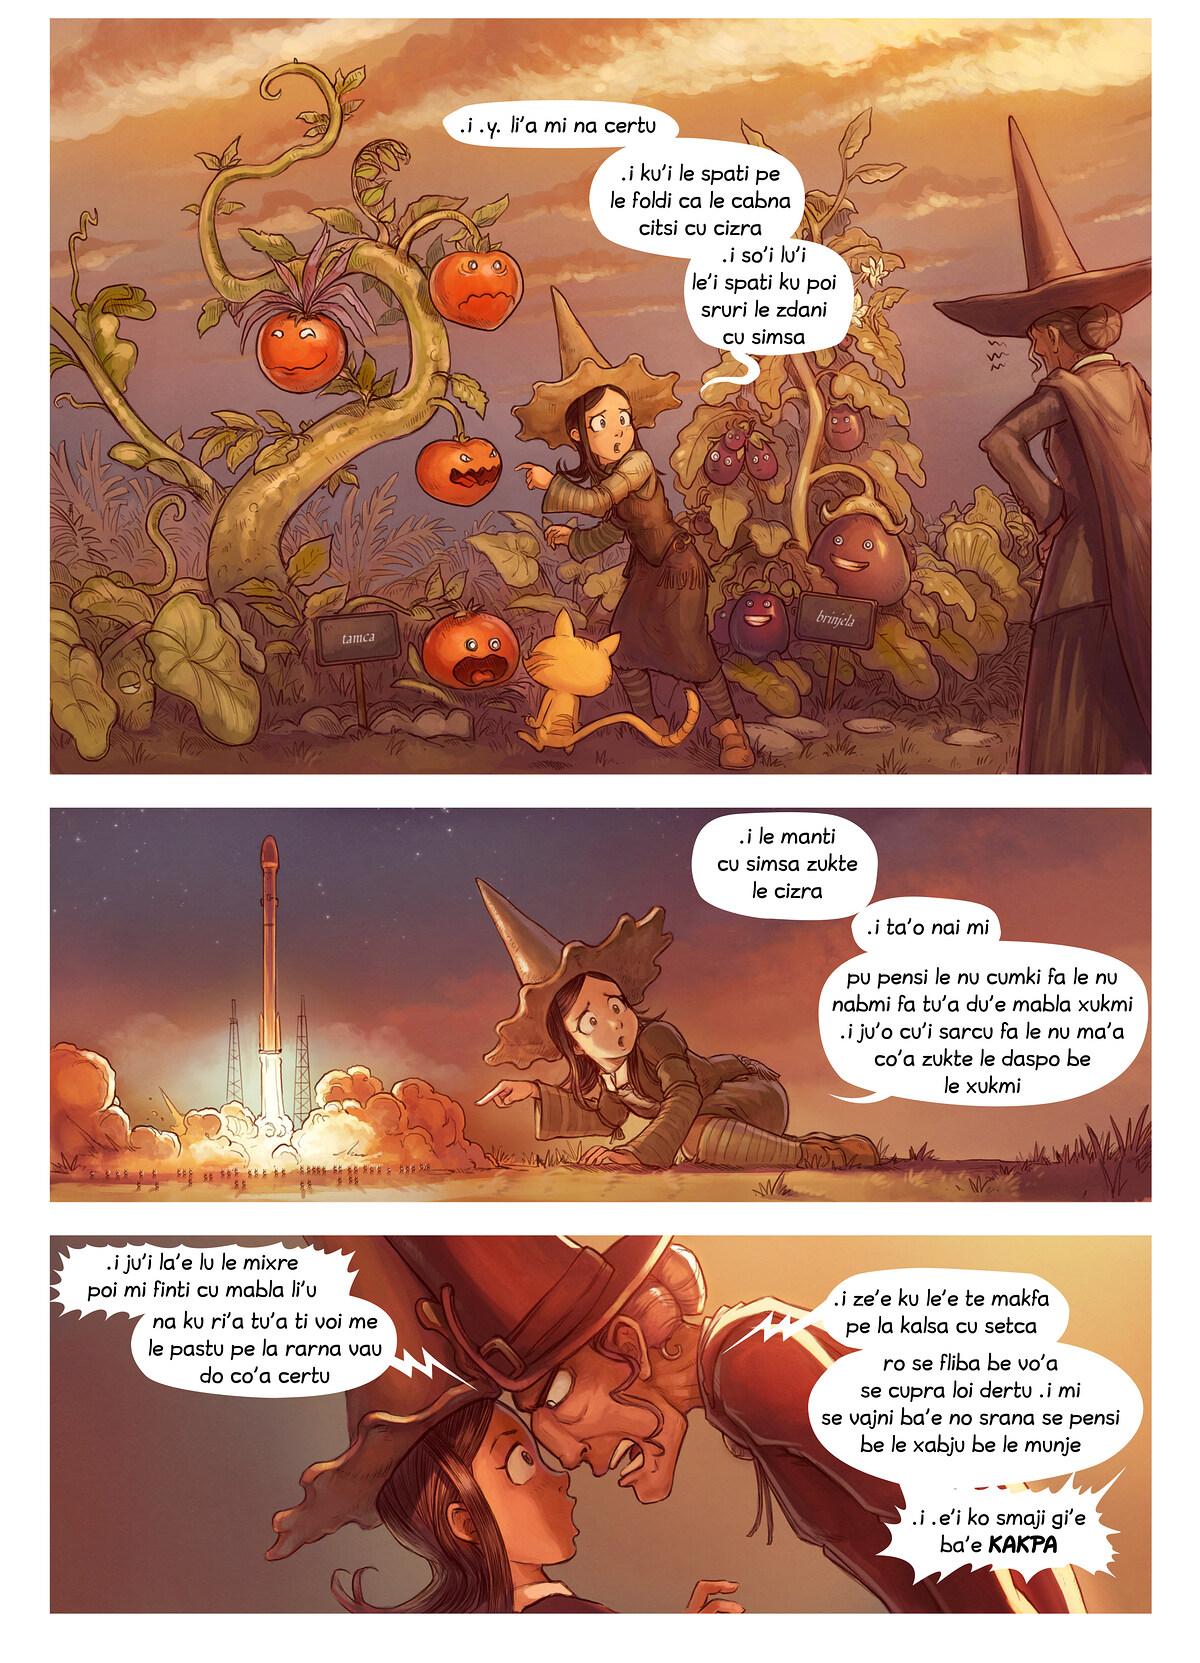 A webcomic page of Pepper&Carrot, pagbu 19 [jb], papri 2